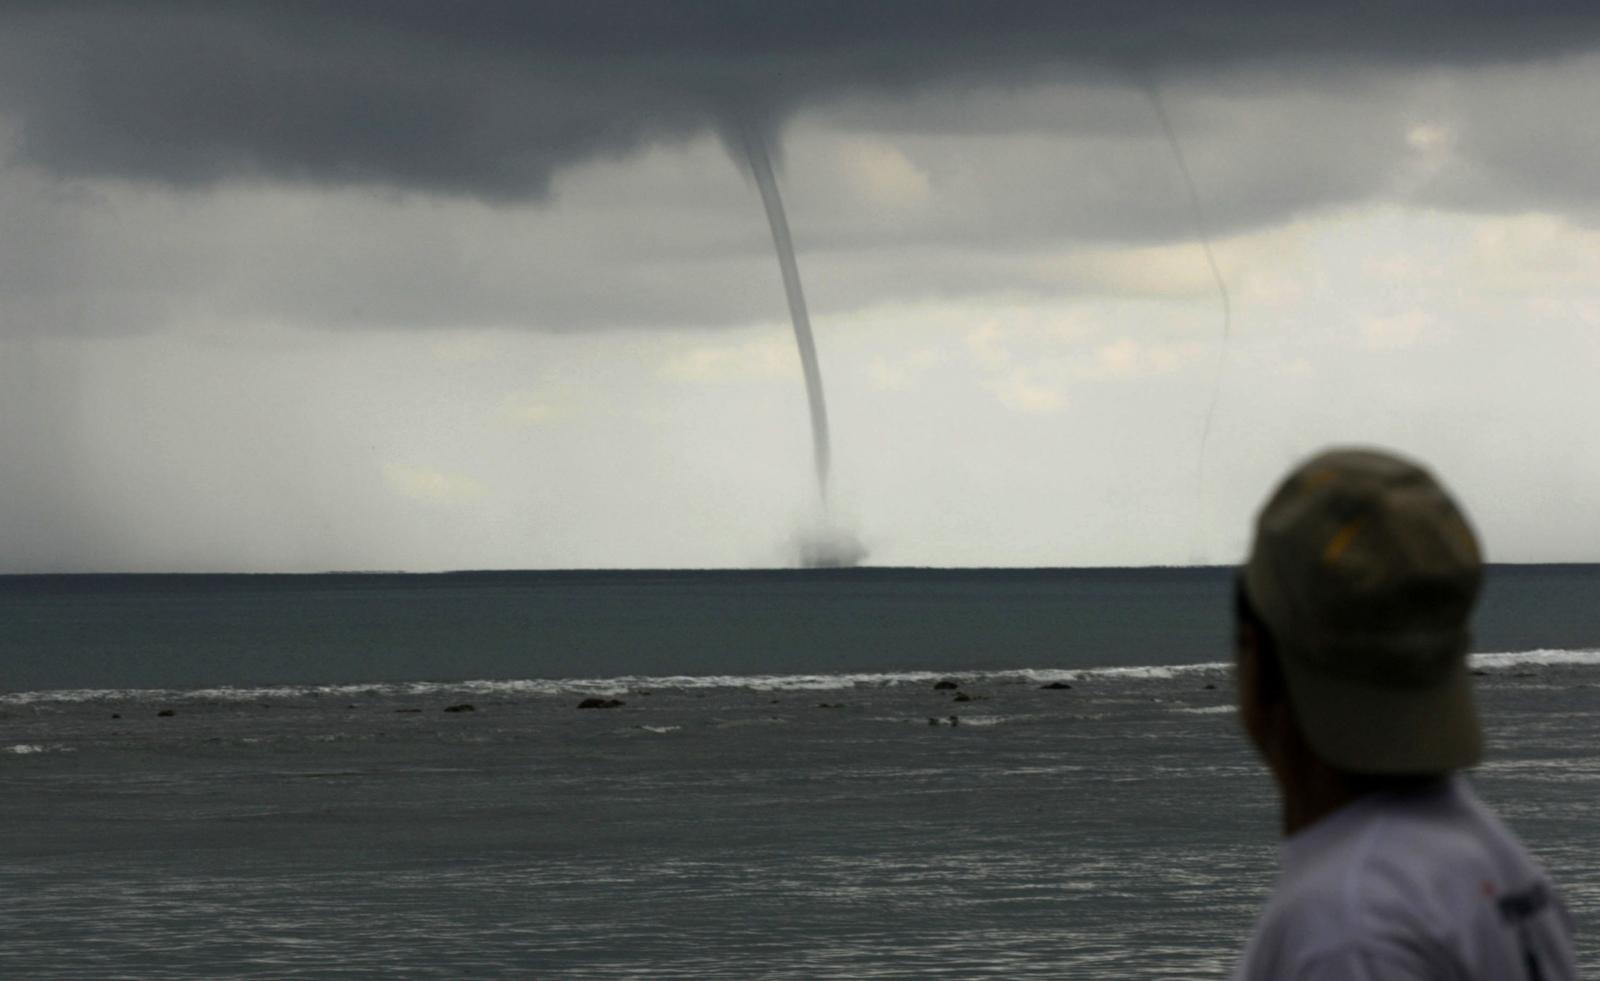 waterspout tornado weather